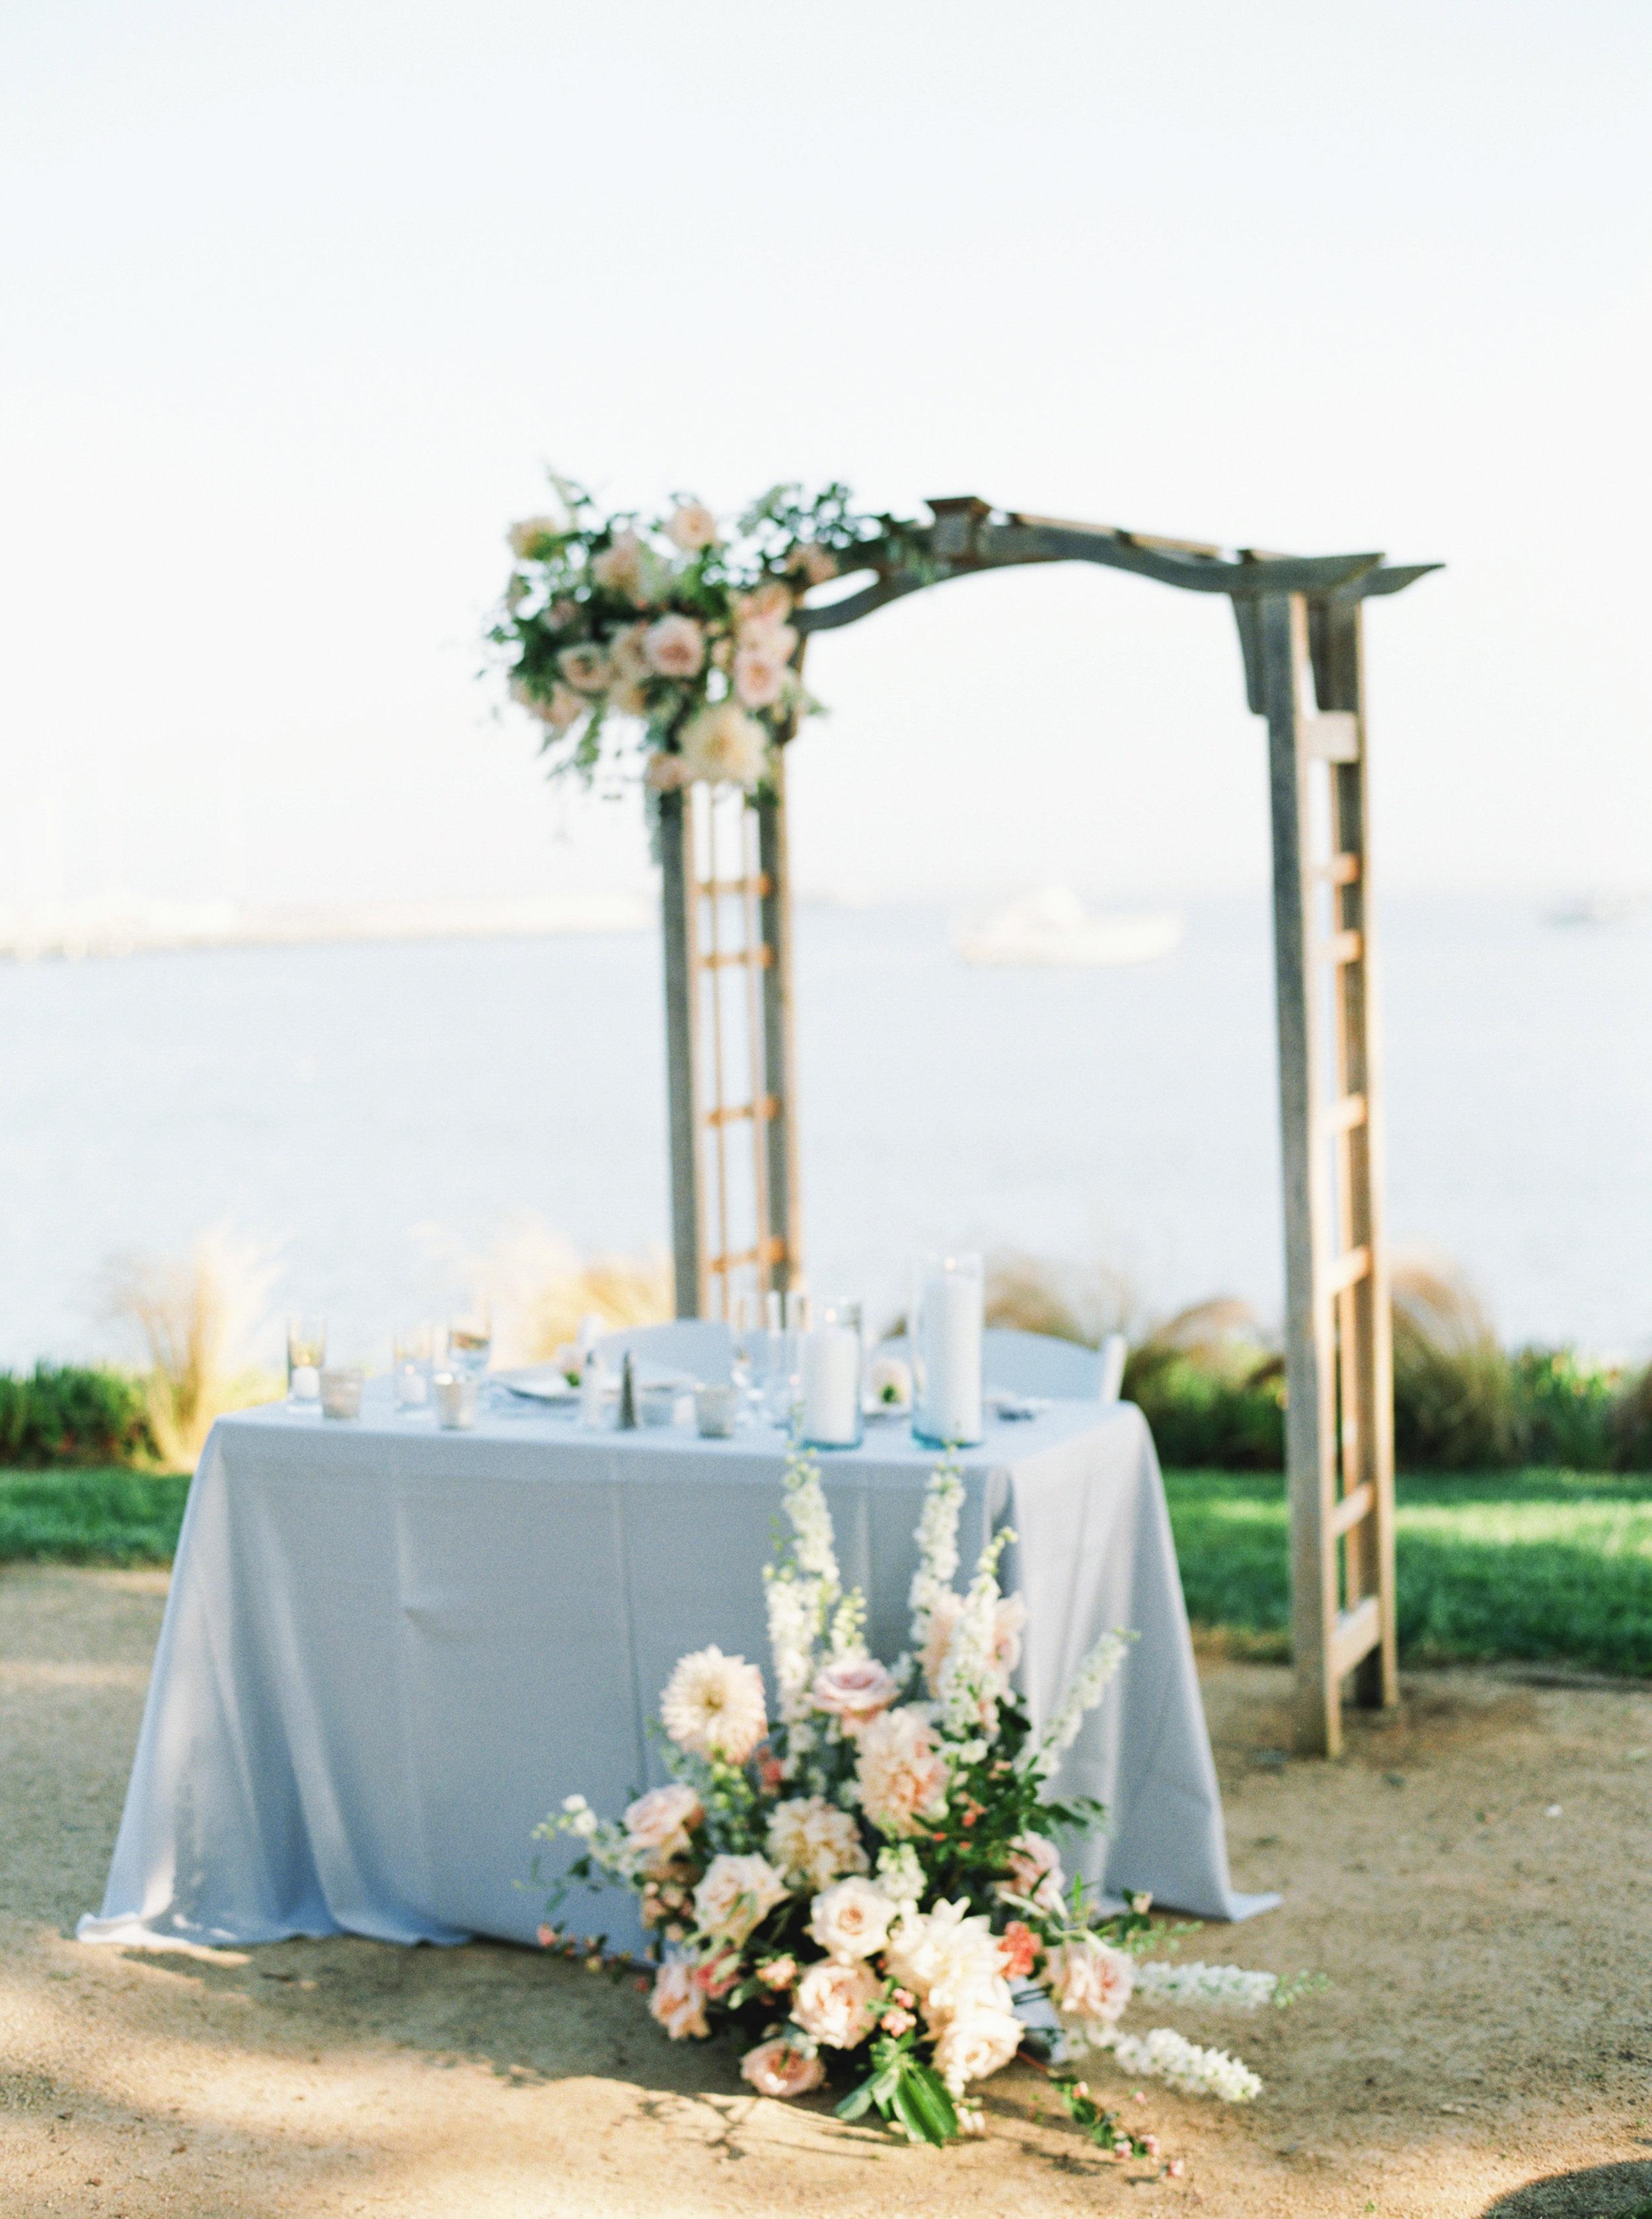 trynhphoto_socal_sf_halfmoon_bay_wedding_photographer_JA-434.jpg